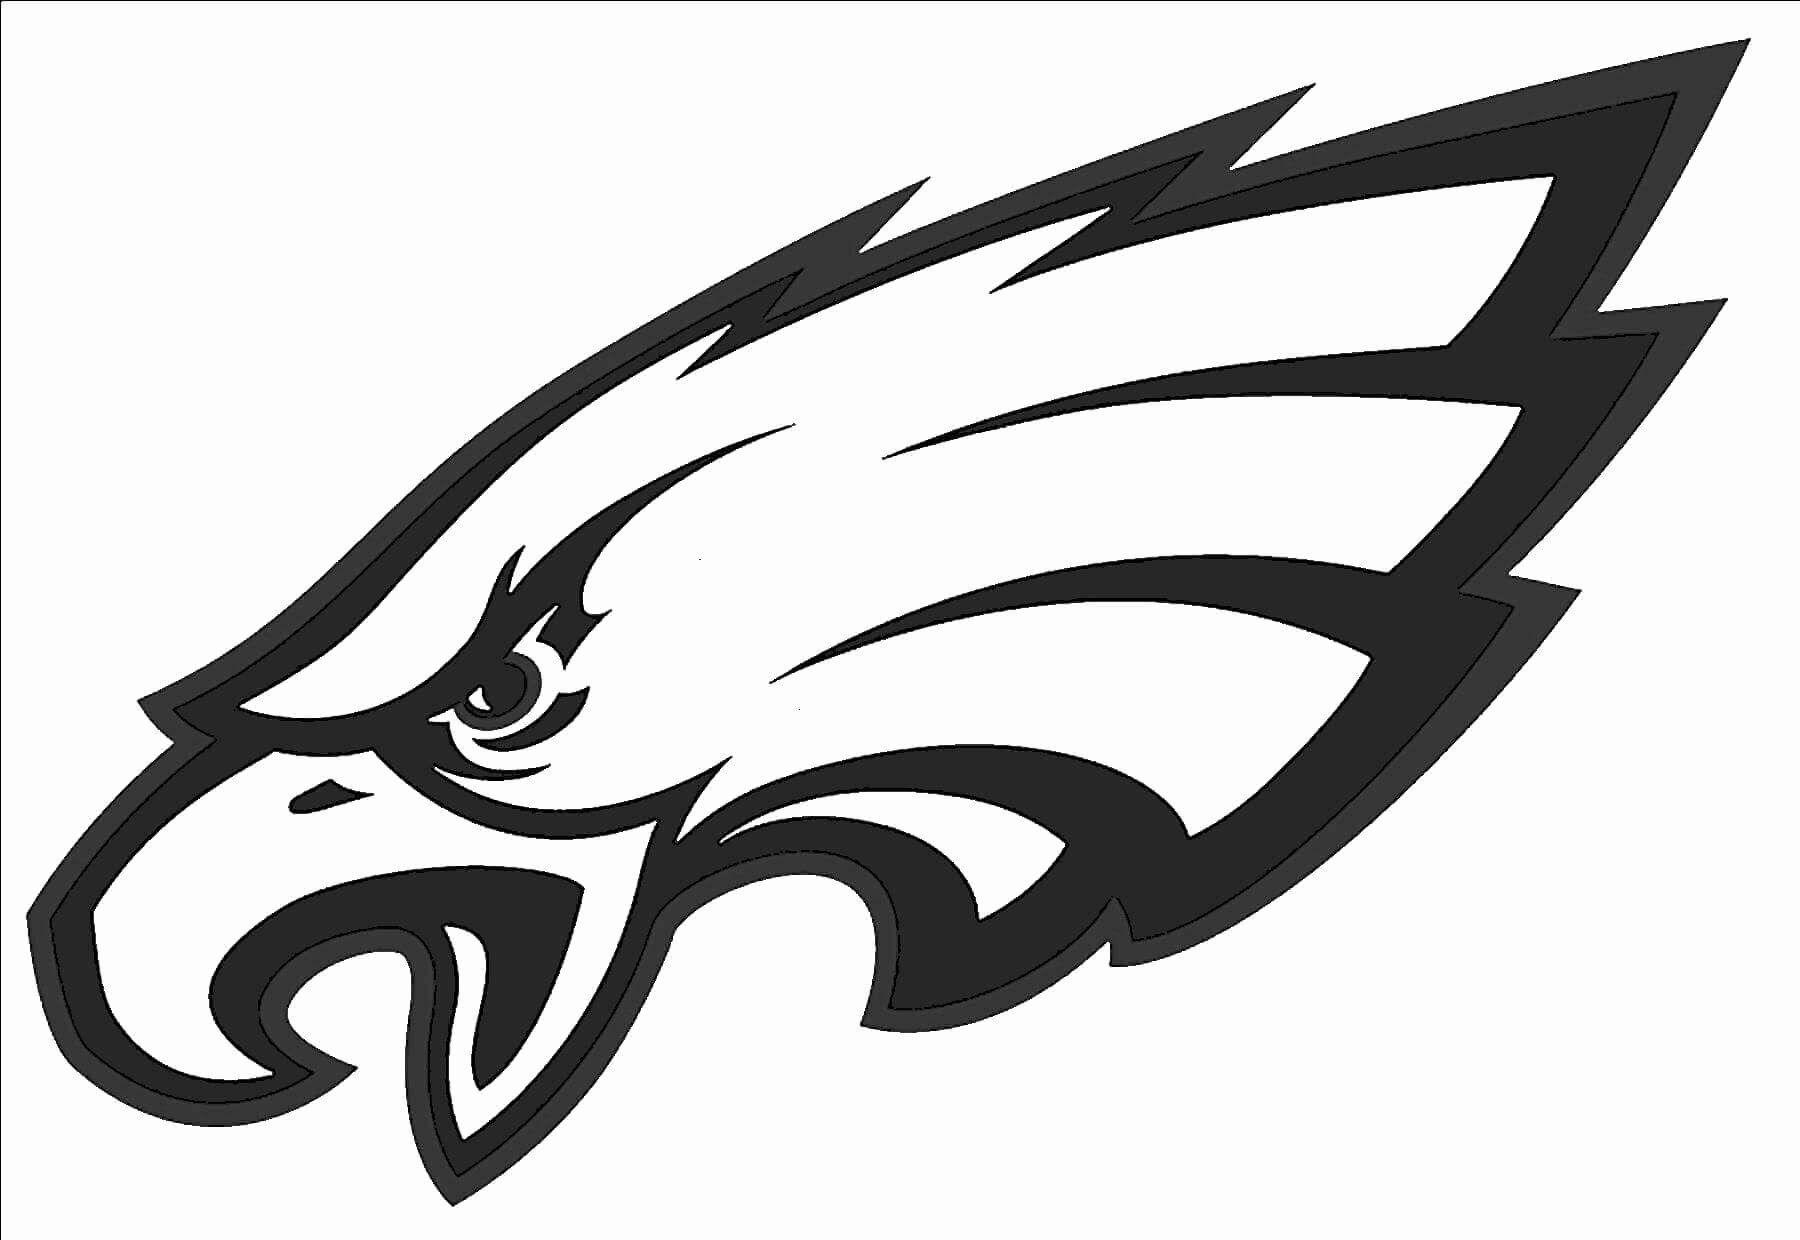 Philadelphia Eagles Coloring Page Inspirational 30 Free Nfl Coloring Pages Printable In 2020 Coloring Pages Nfl Philadelphia Eagles Coloring Pages Inspirational